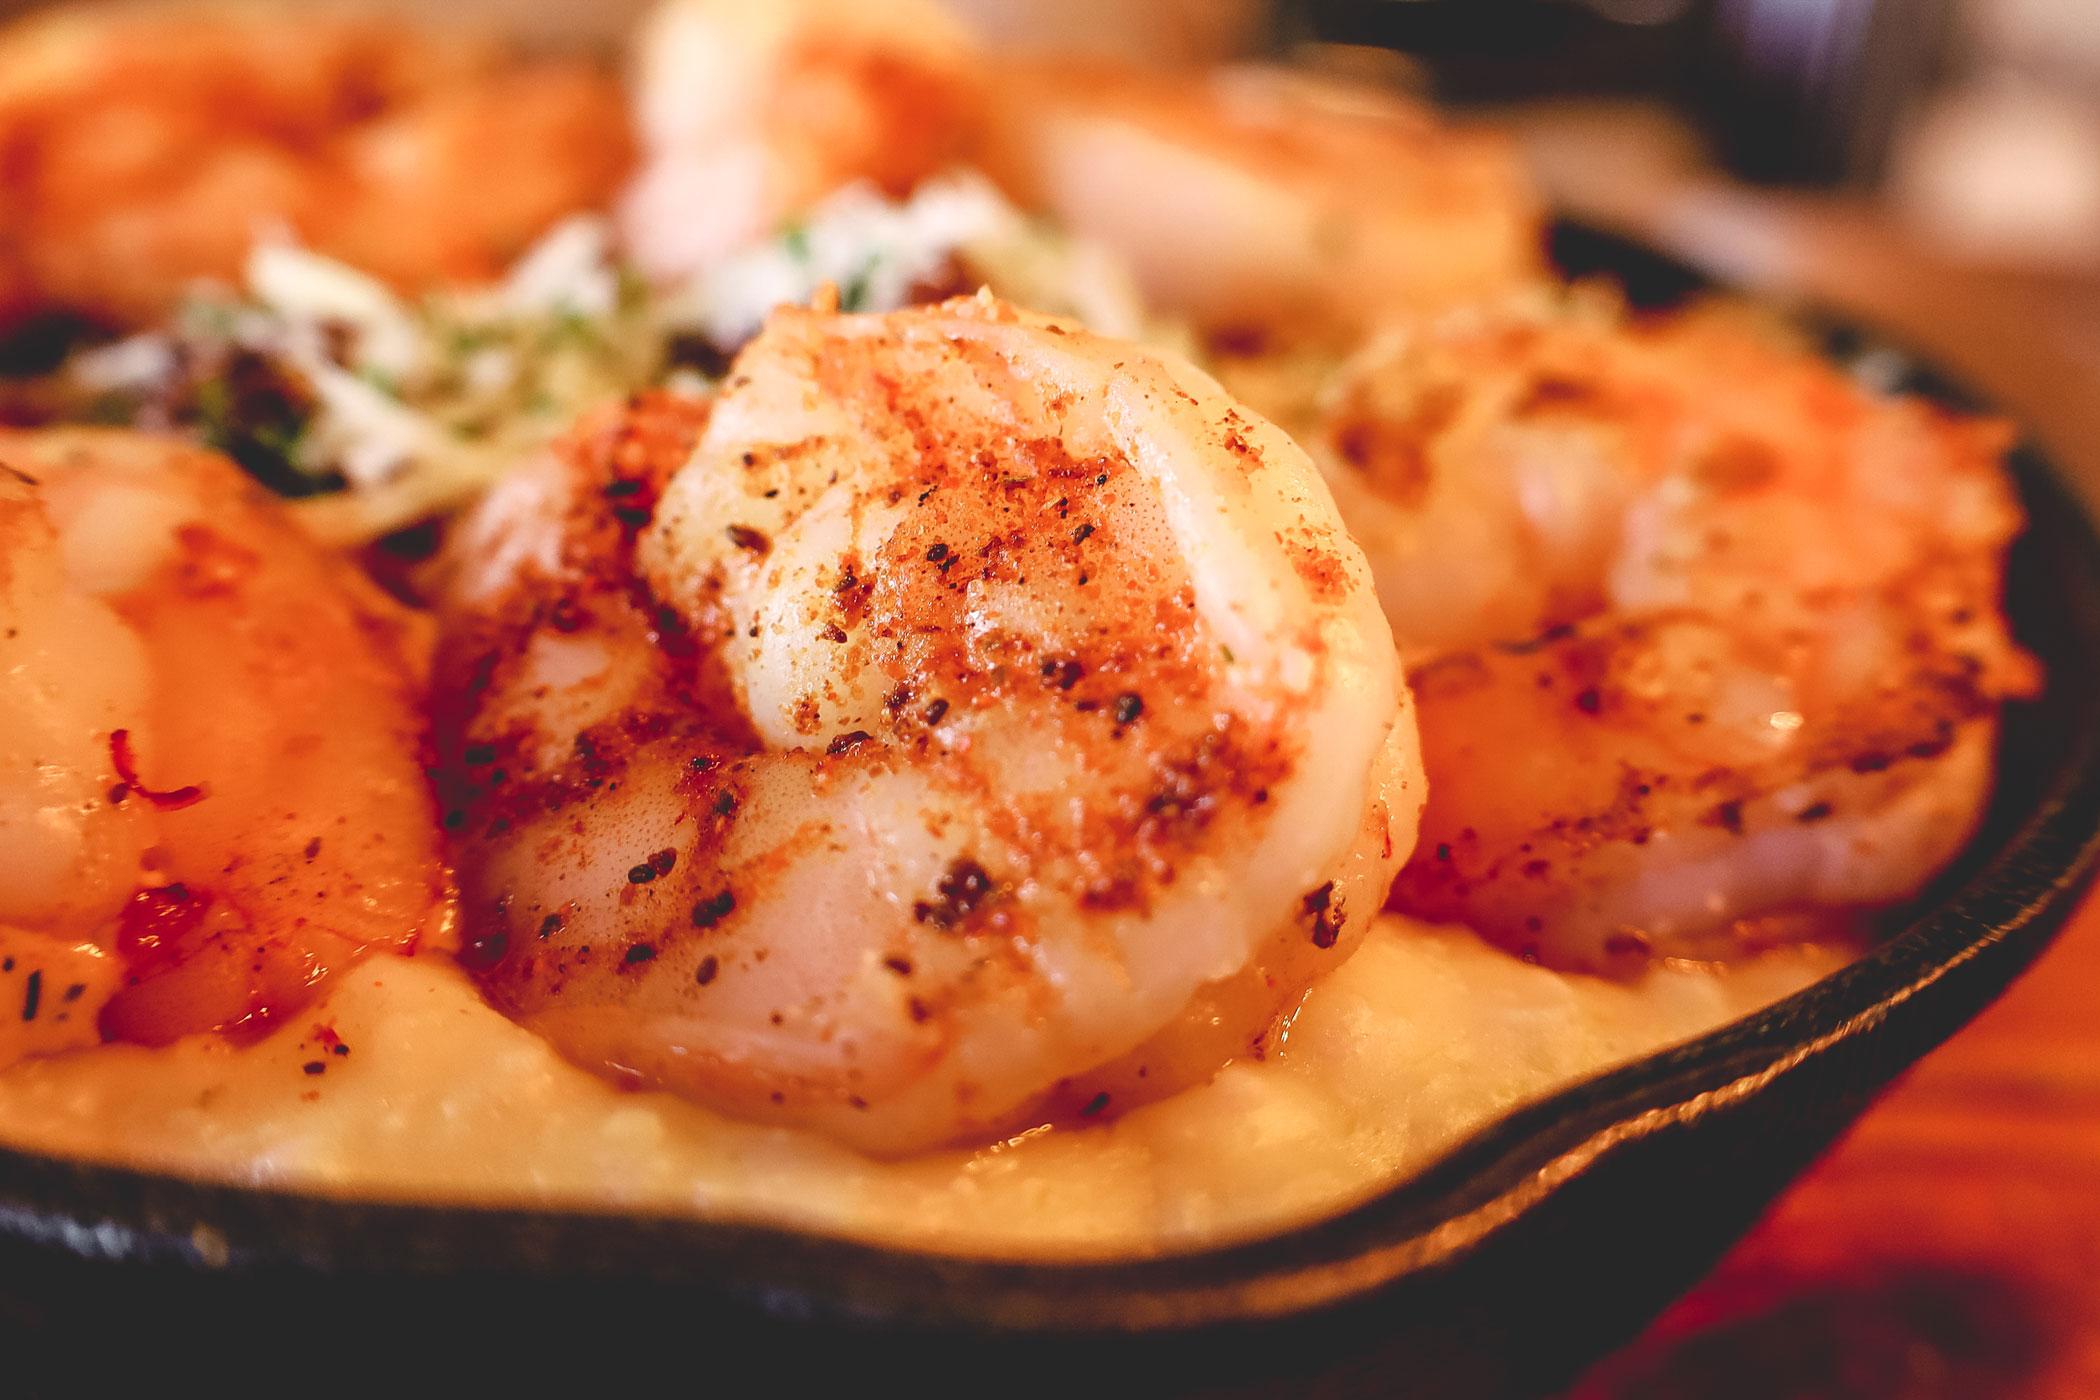 A closeup of a perfectly seasoned shrimp.